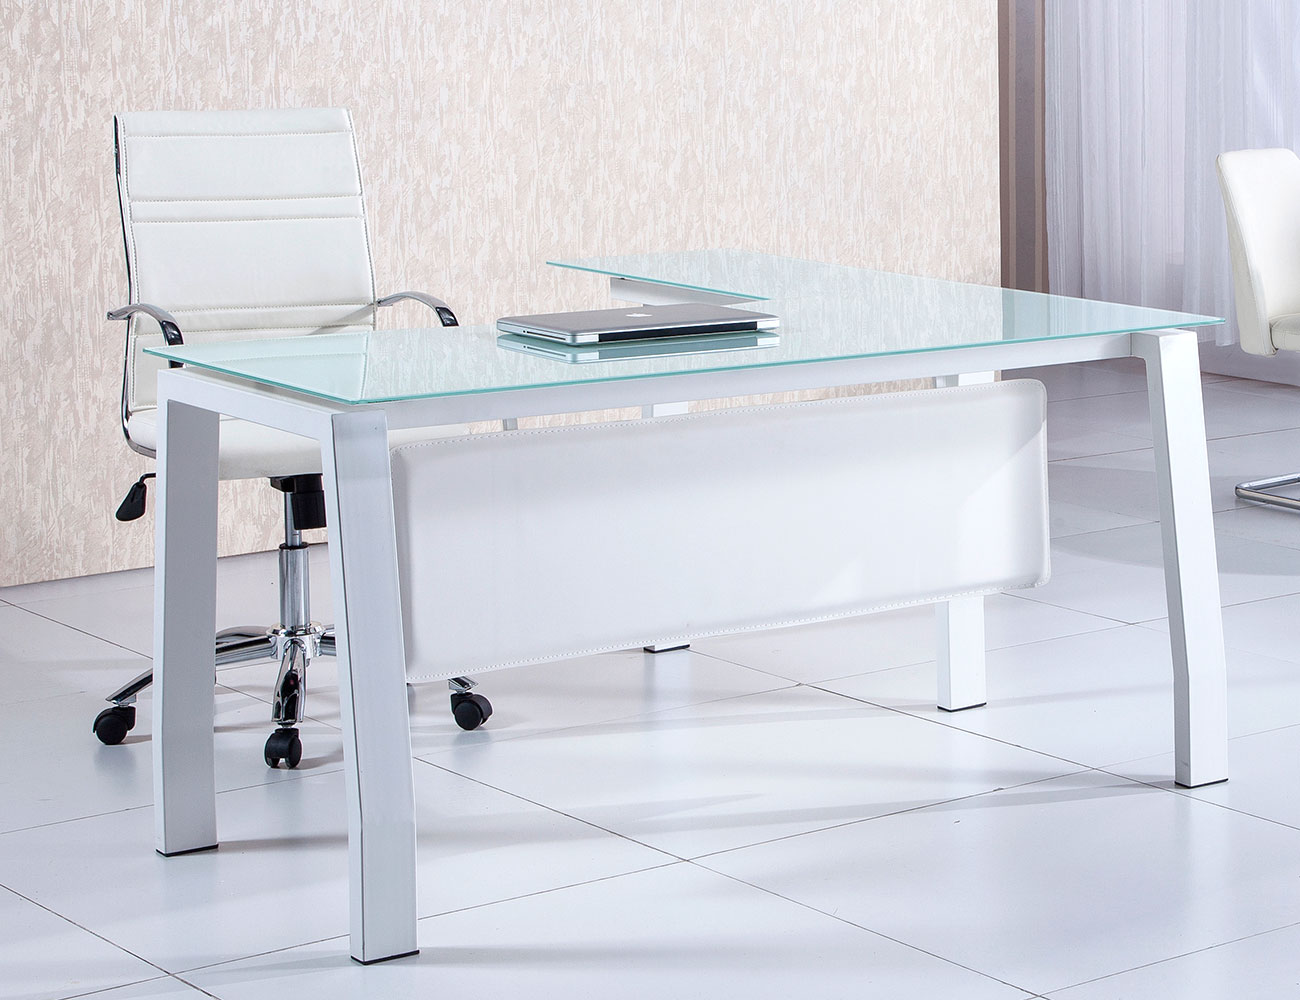 Mesa despacho oficina cristal templado blanca1